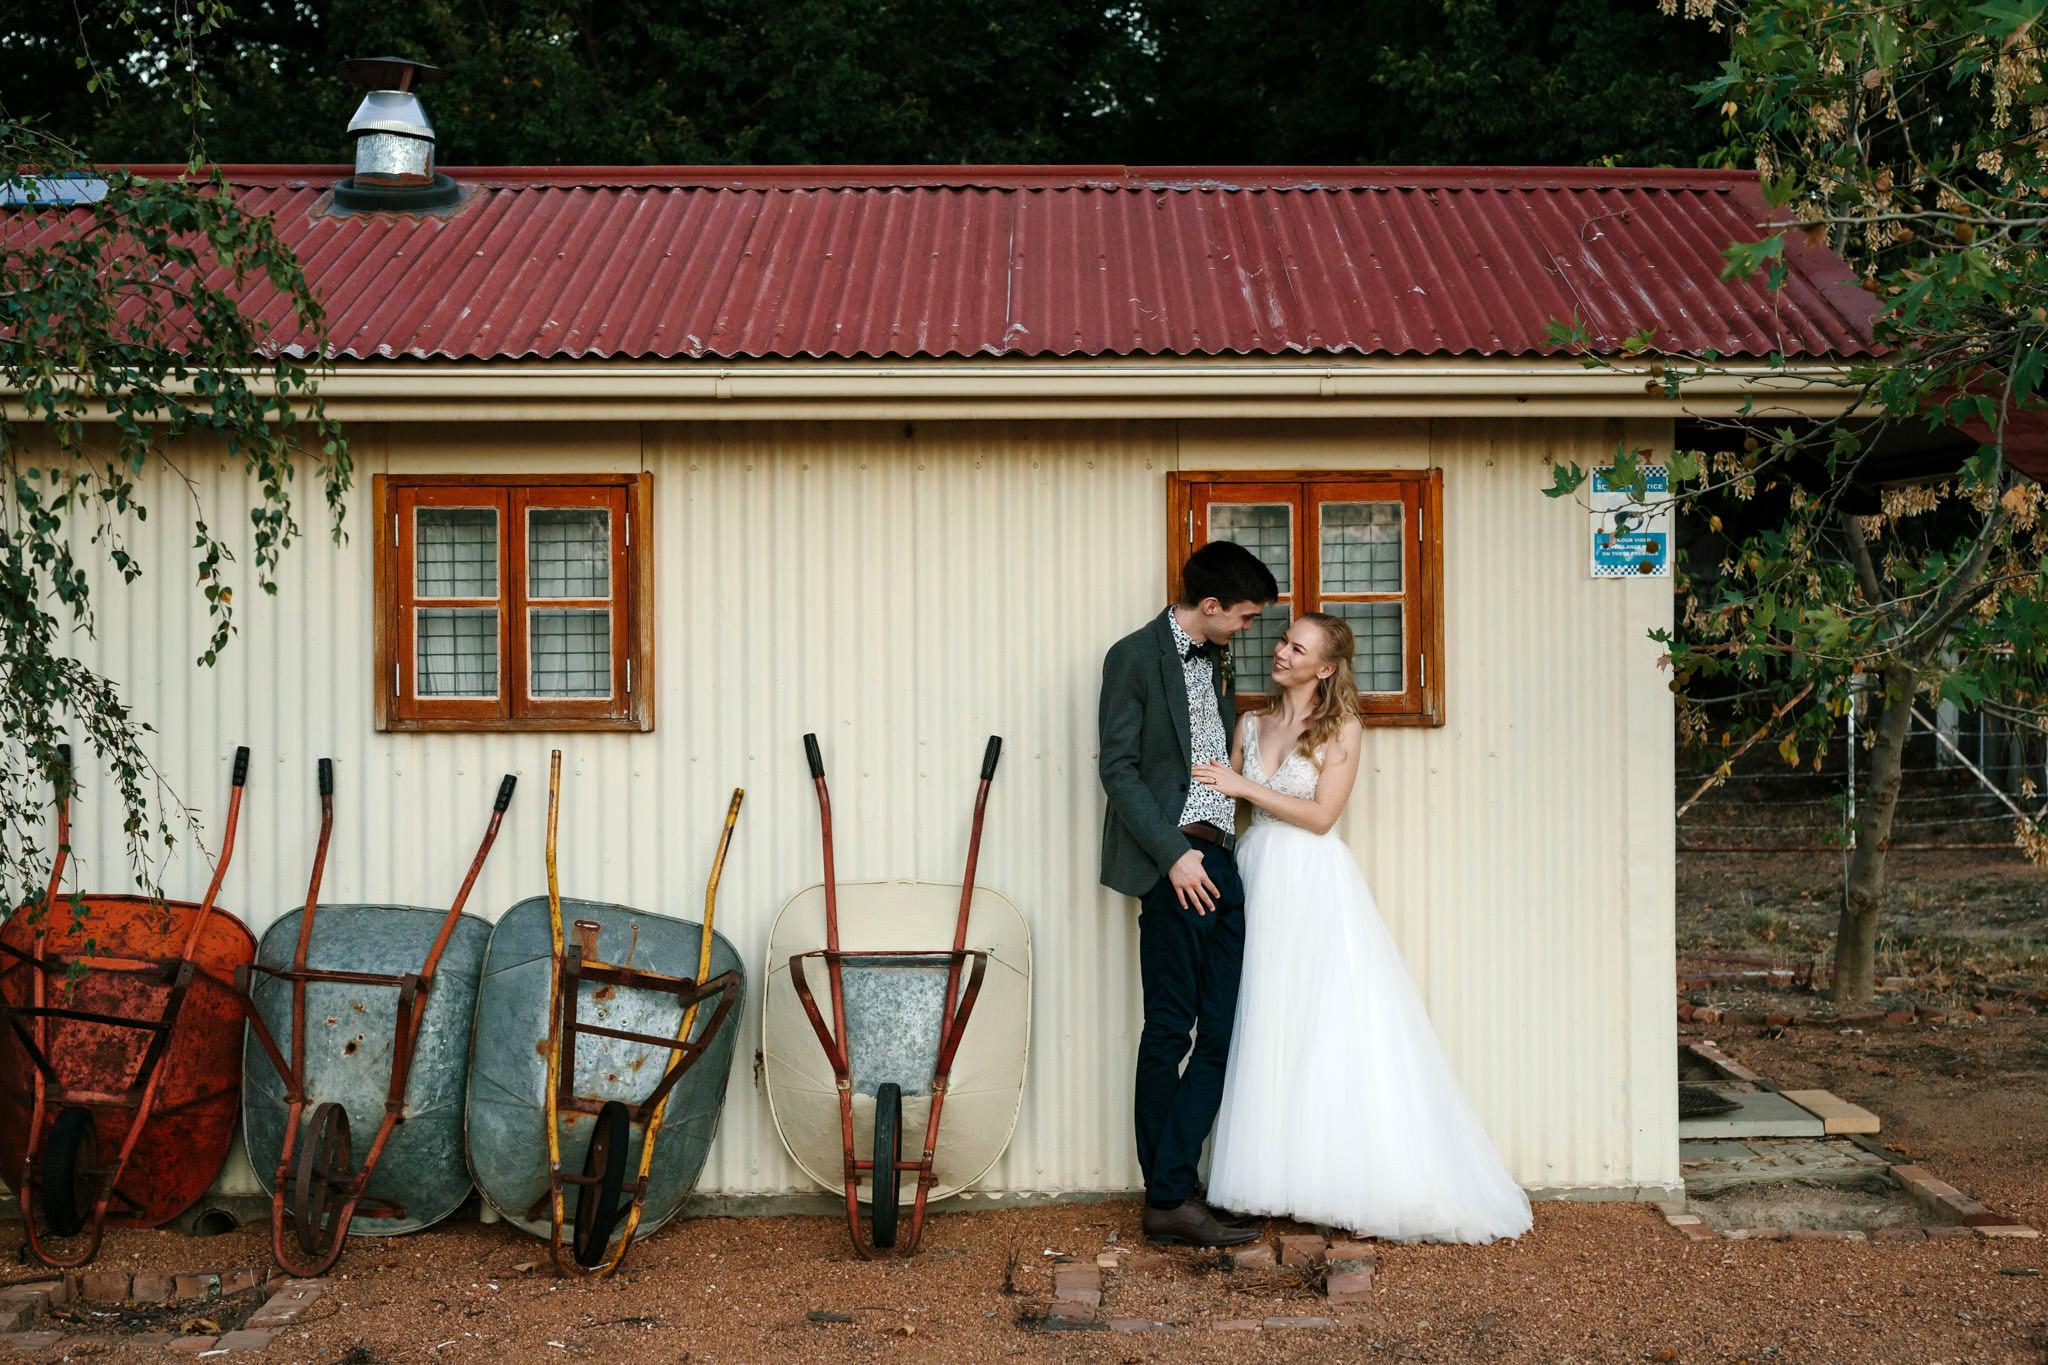 Erin_Latimore_Mudgee_Canberra_Wedding_Photographer_Tuggeranong_Homestead_515.JPG